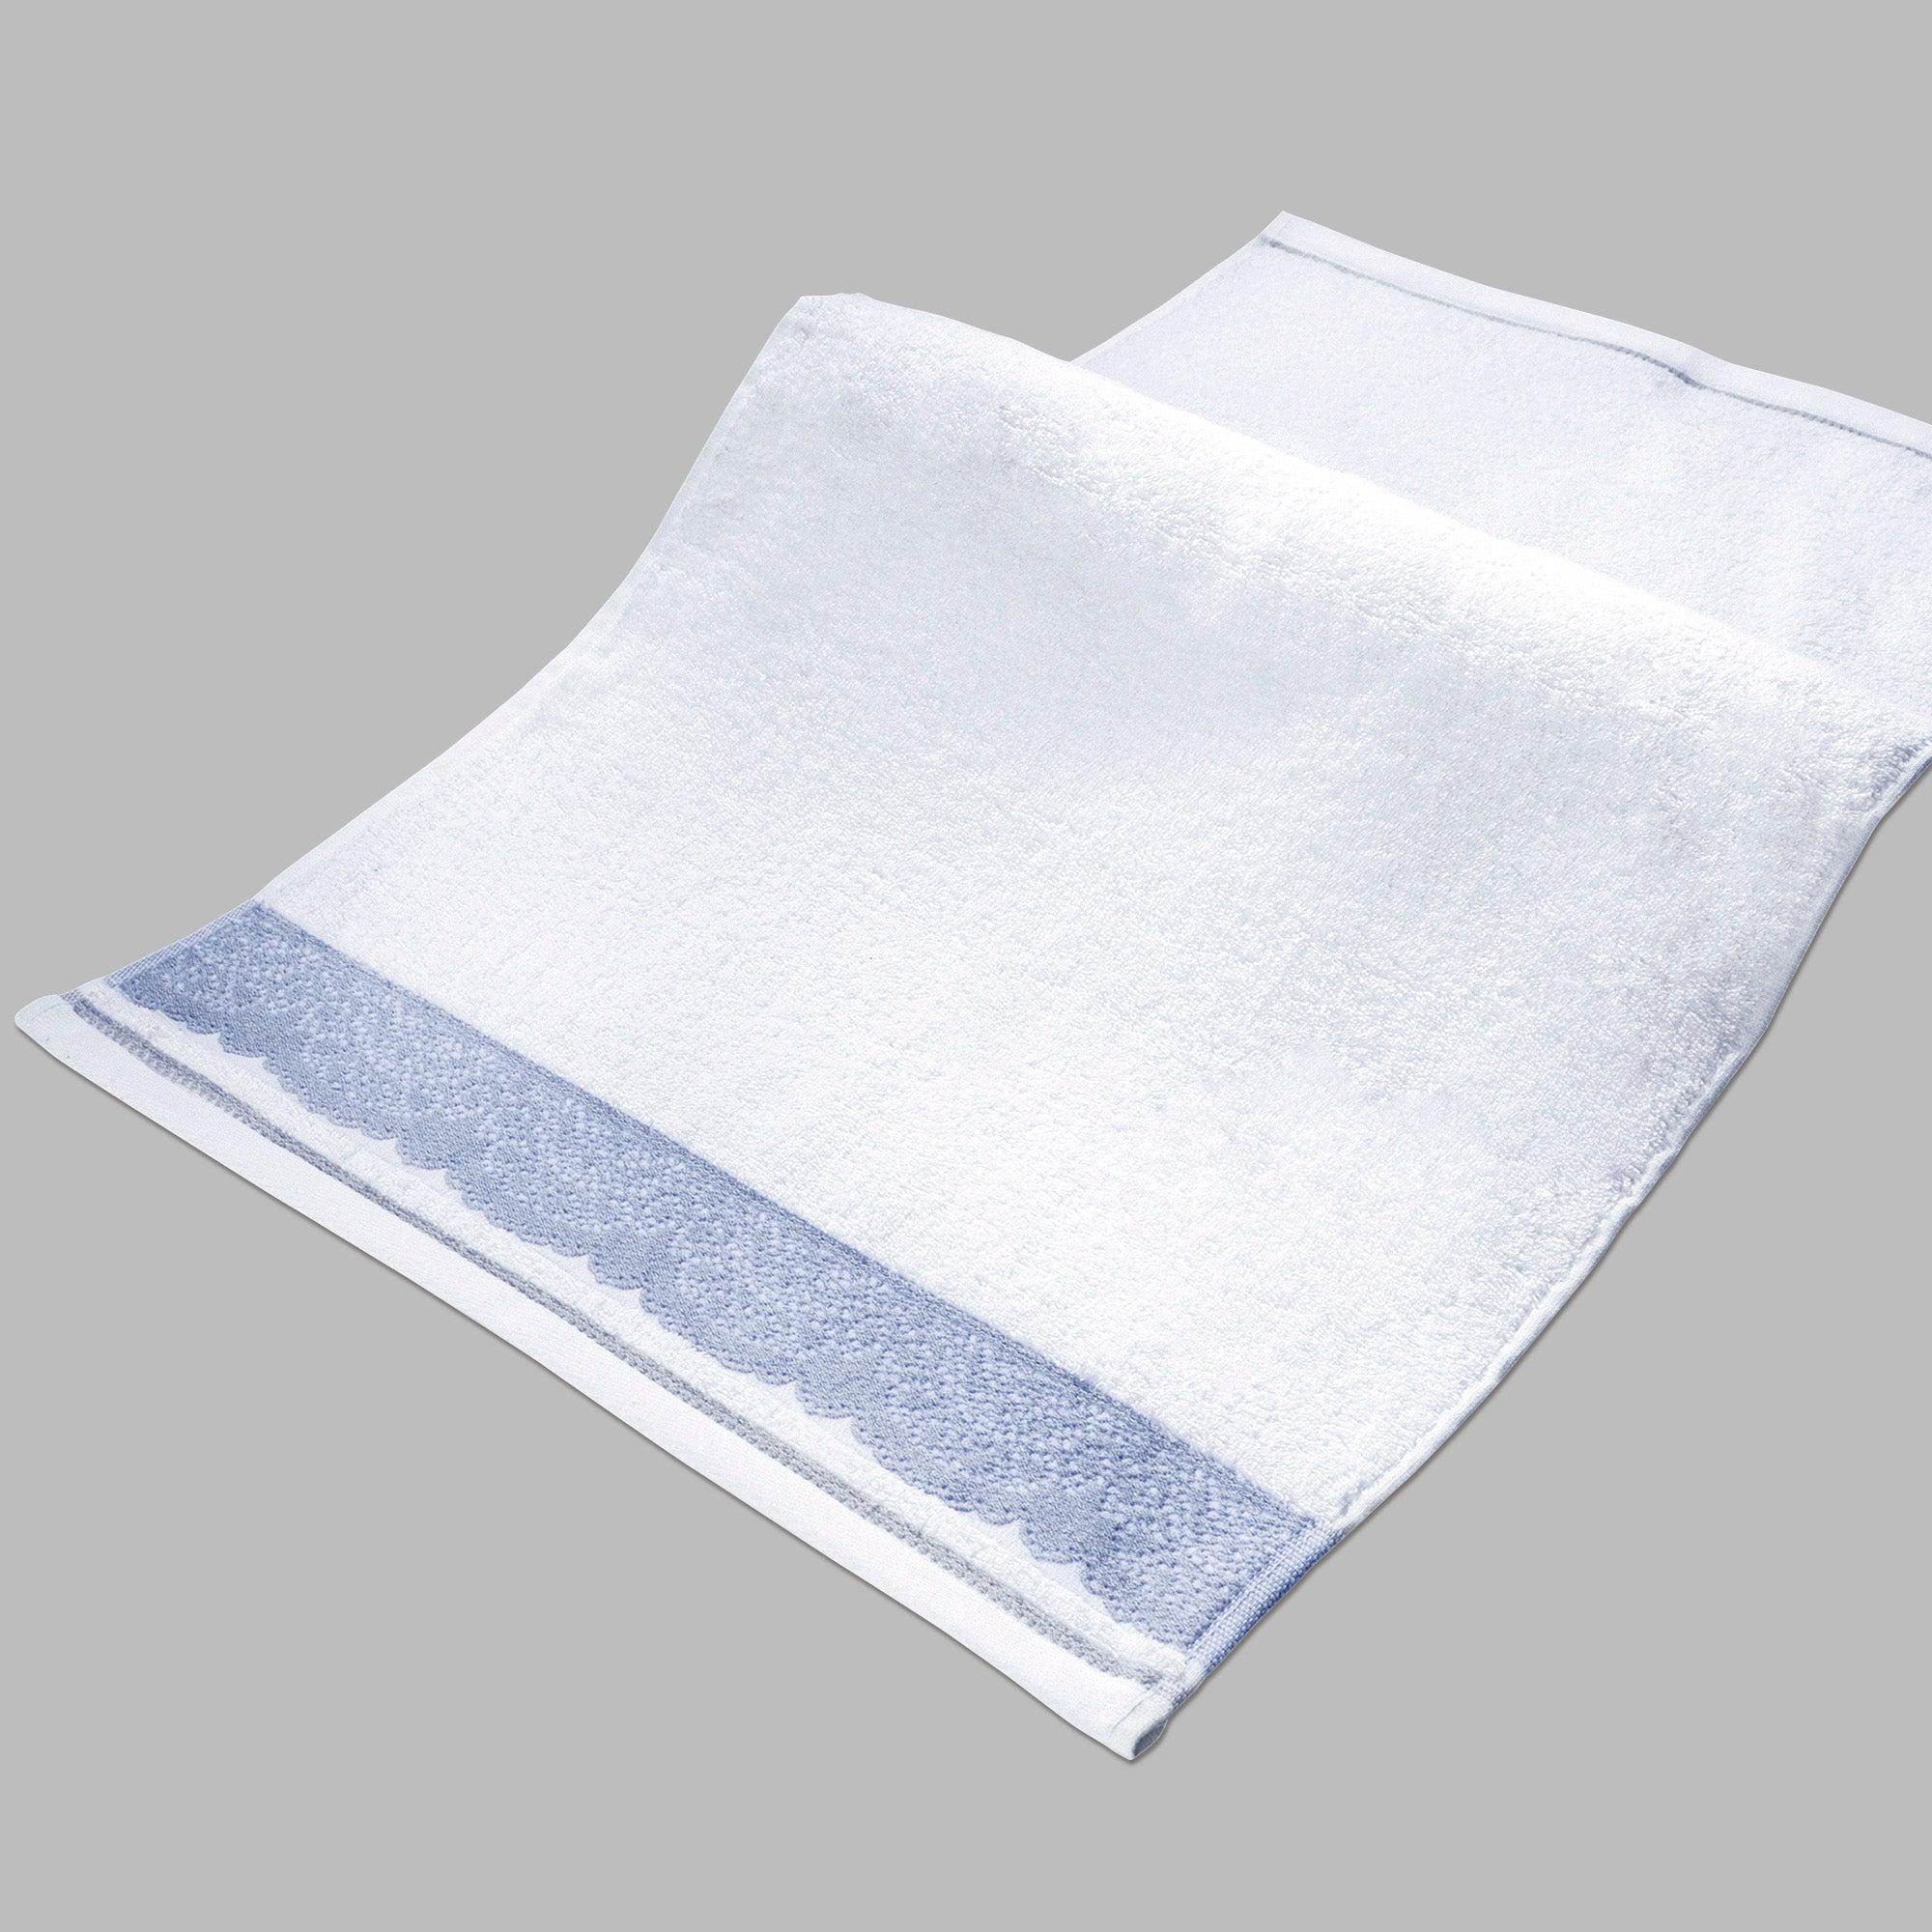 Hotel White Jacquard Lace Towel